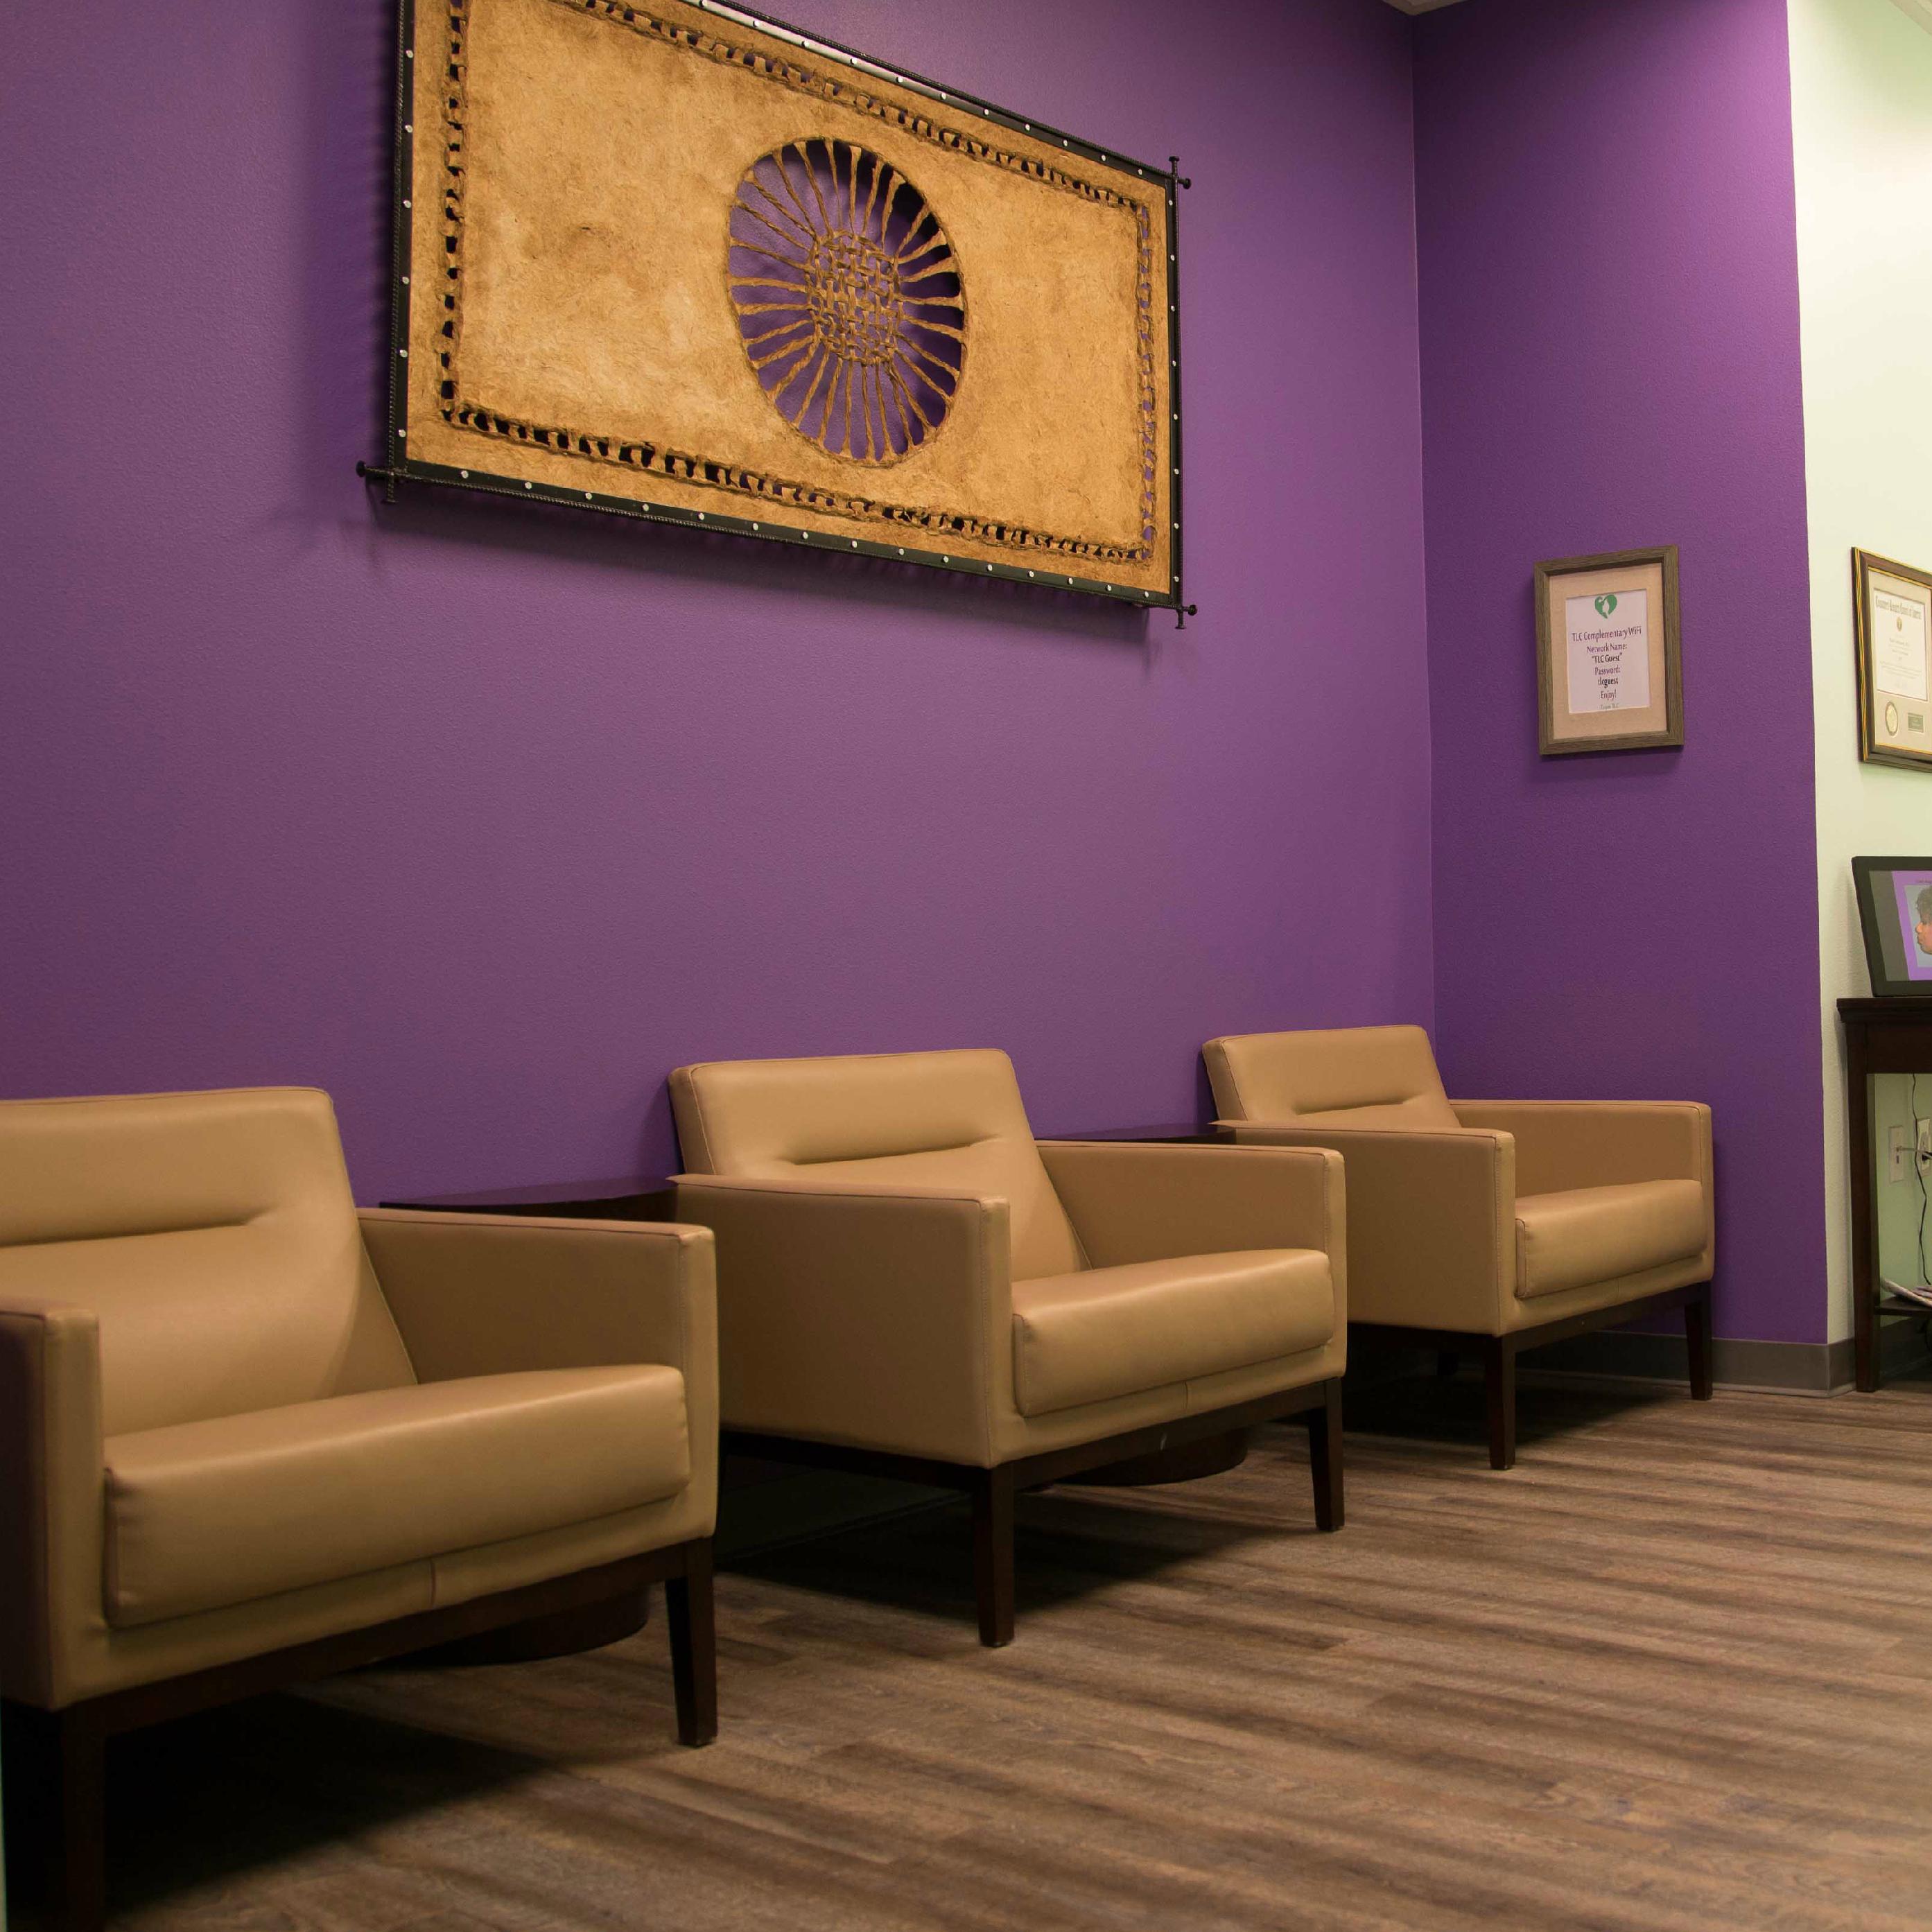 The Lanfranchi Center for Facial Plastic Surgery & Rejuvenation image 3